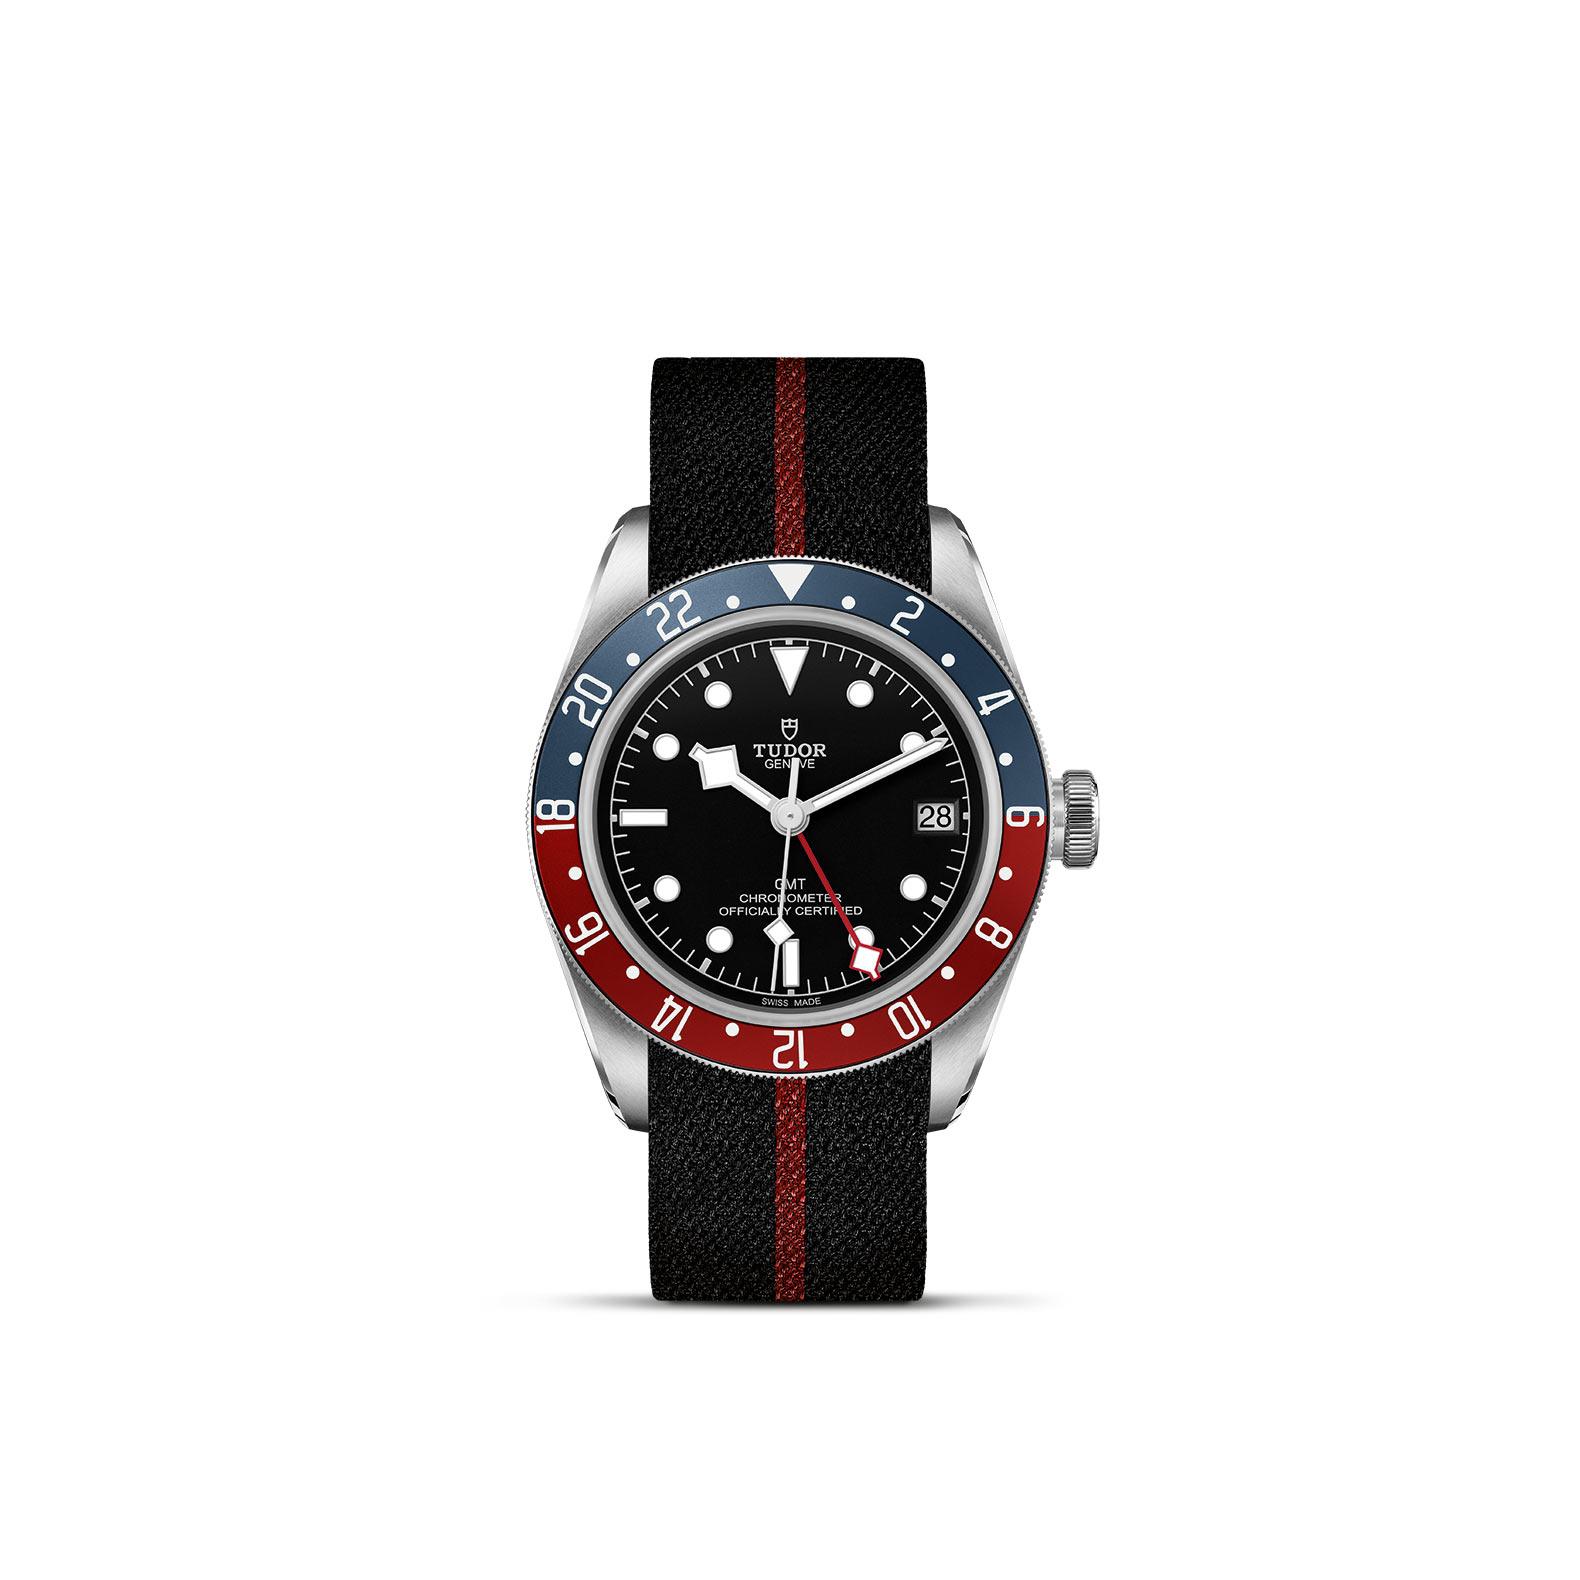 TUDOR Black Bay GMT M79830RB 0003 Upright